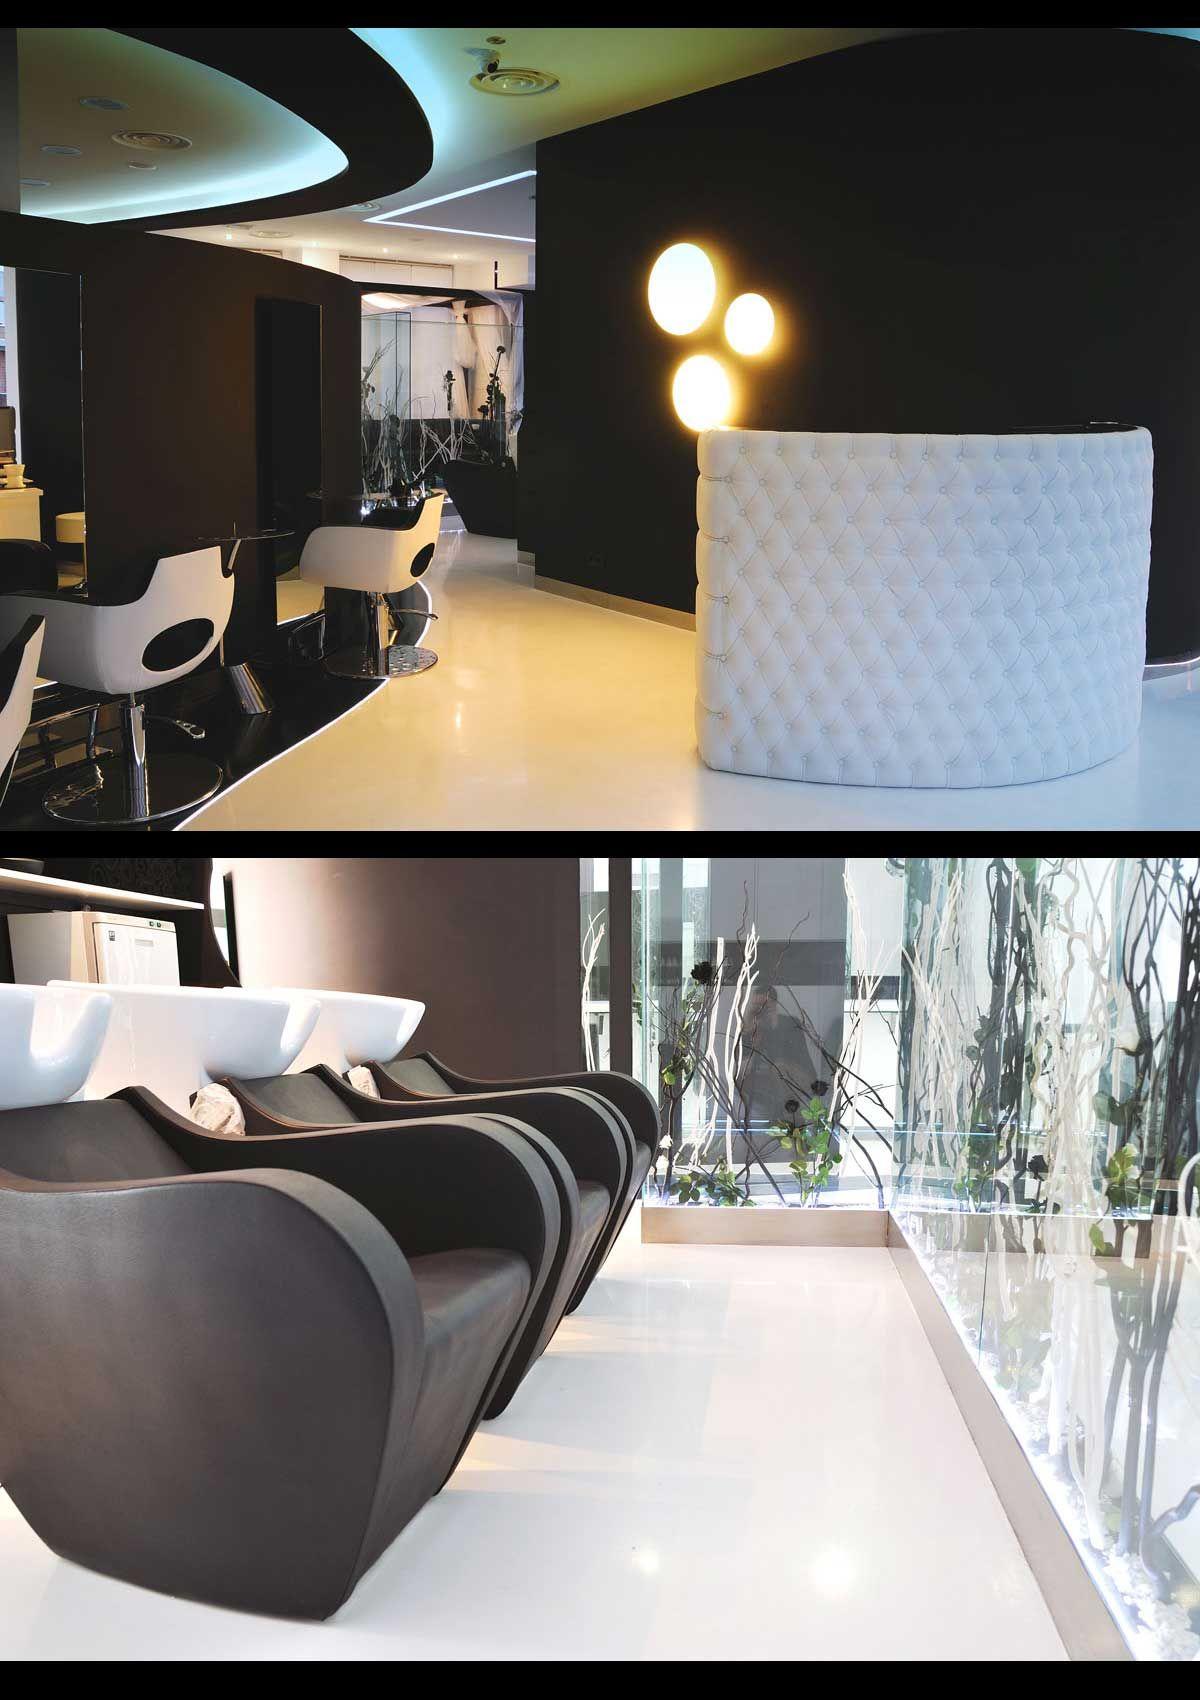 Salon Raquel Blanco Black And White L On Spain Salonideas  # Muebles Gamma San Juan